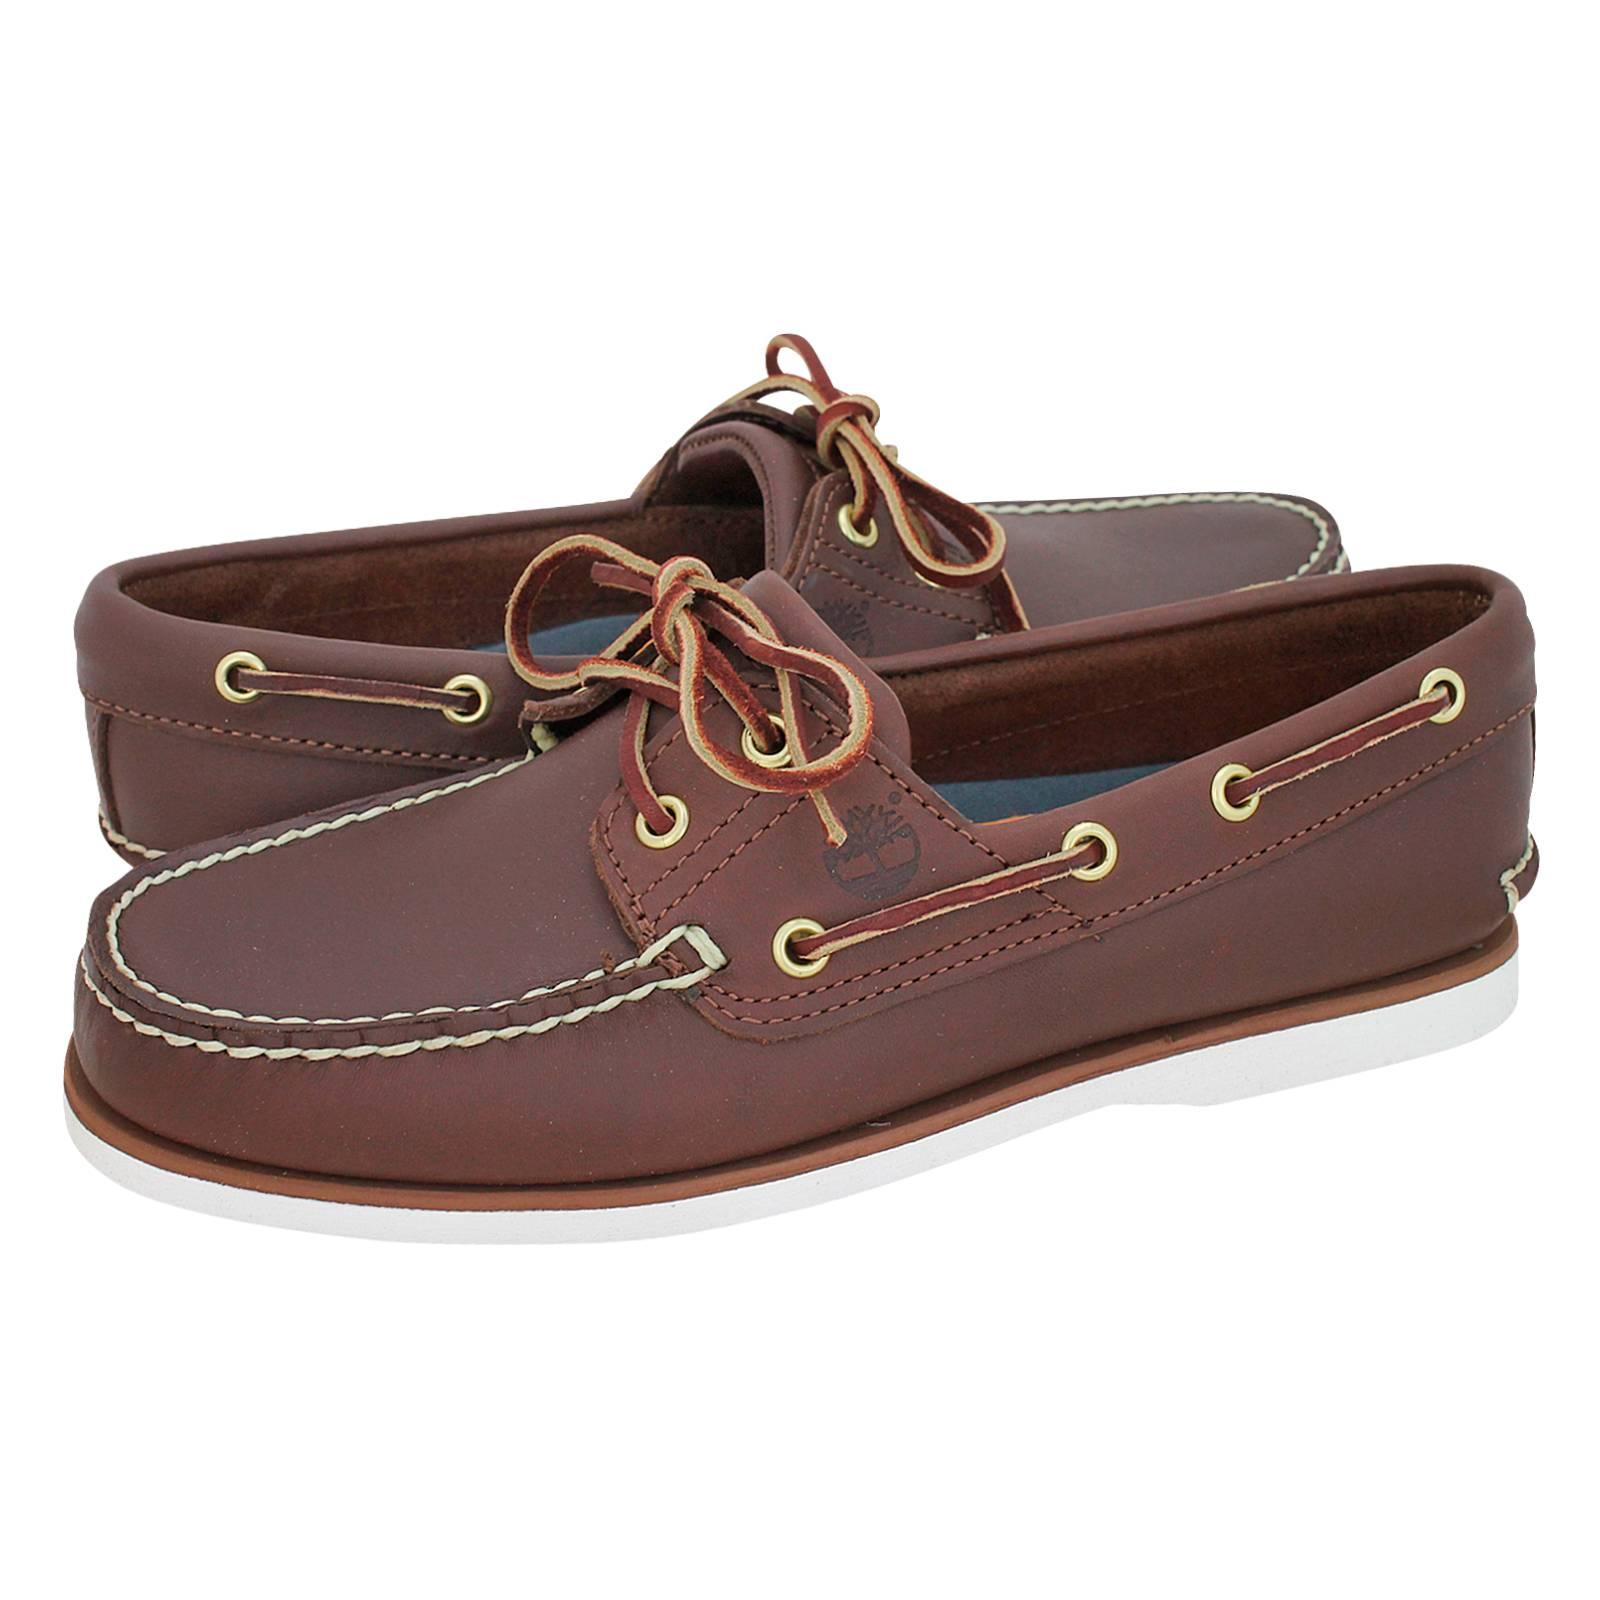 Timberland Clasic Boat 2 Eye Boat boat shoes